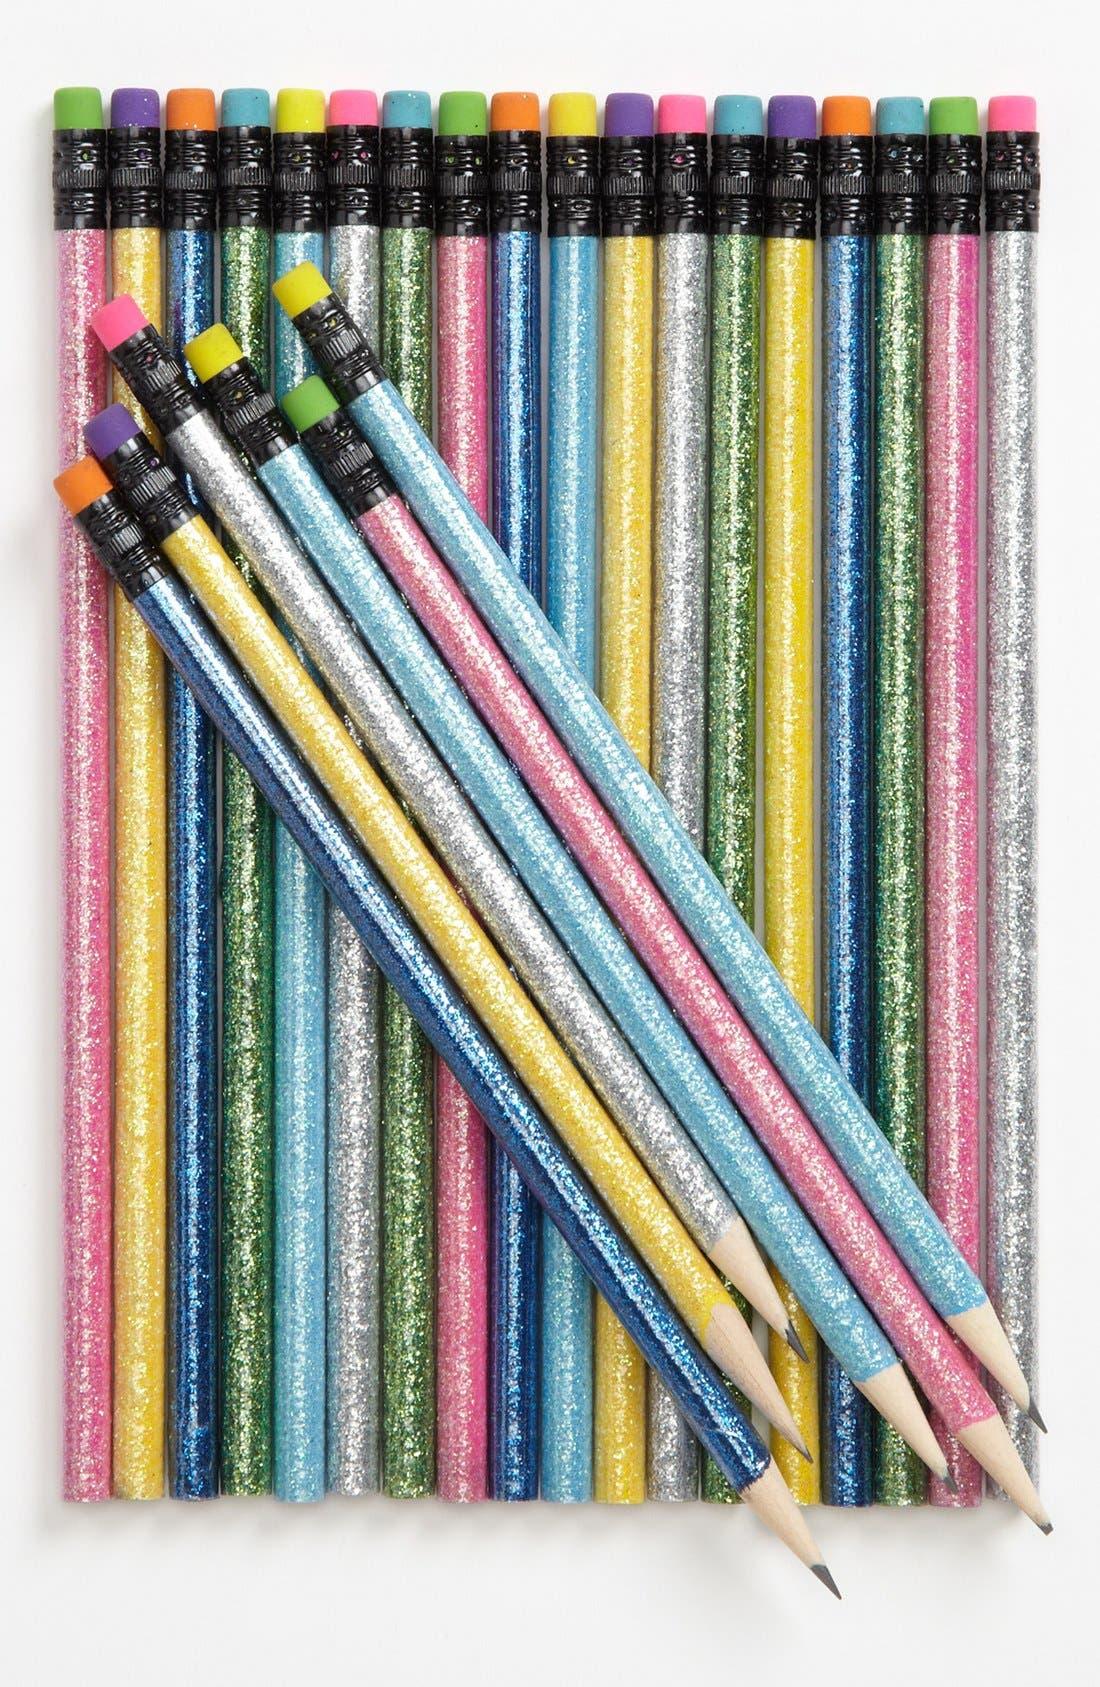 Main Image - International Arrivals 'Twinkle Twinkle' Pencils (Set of 24) (Girls)